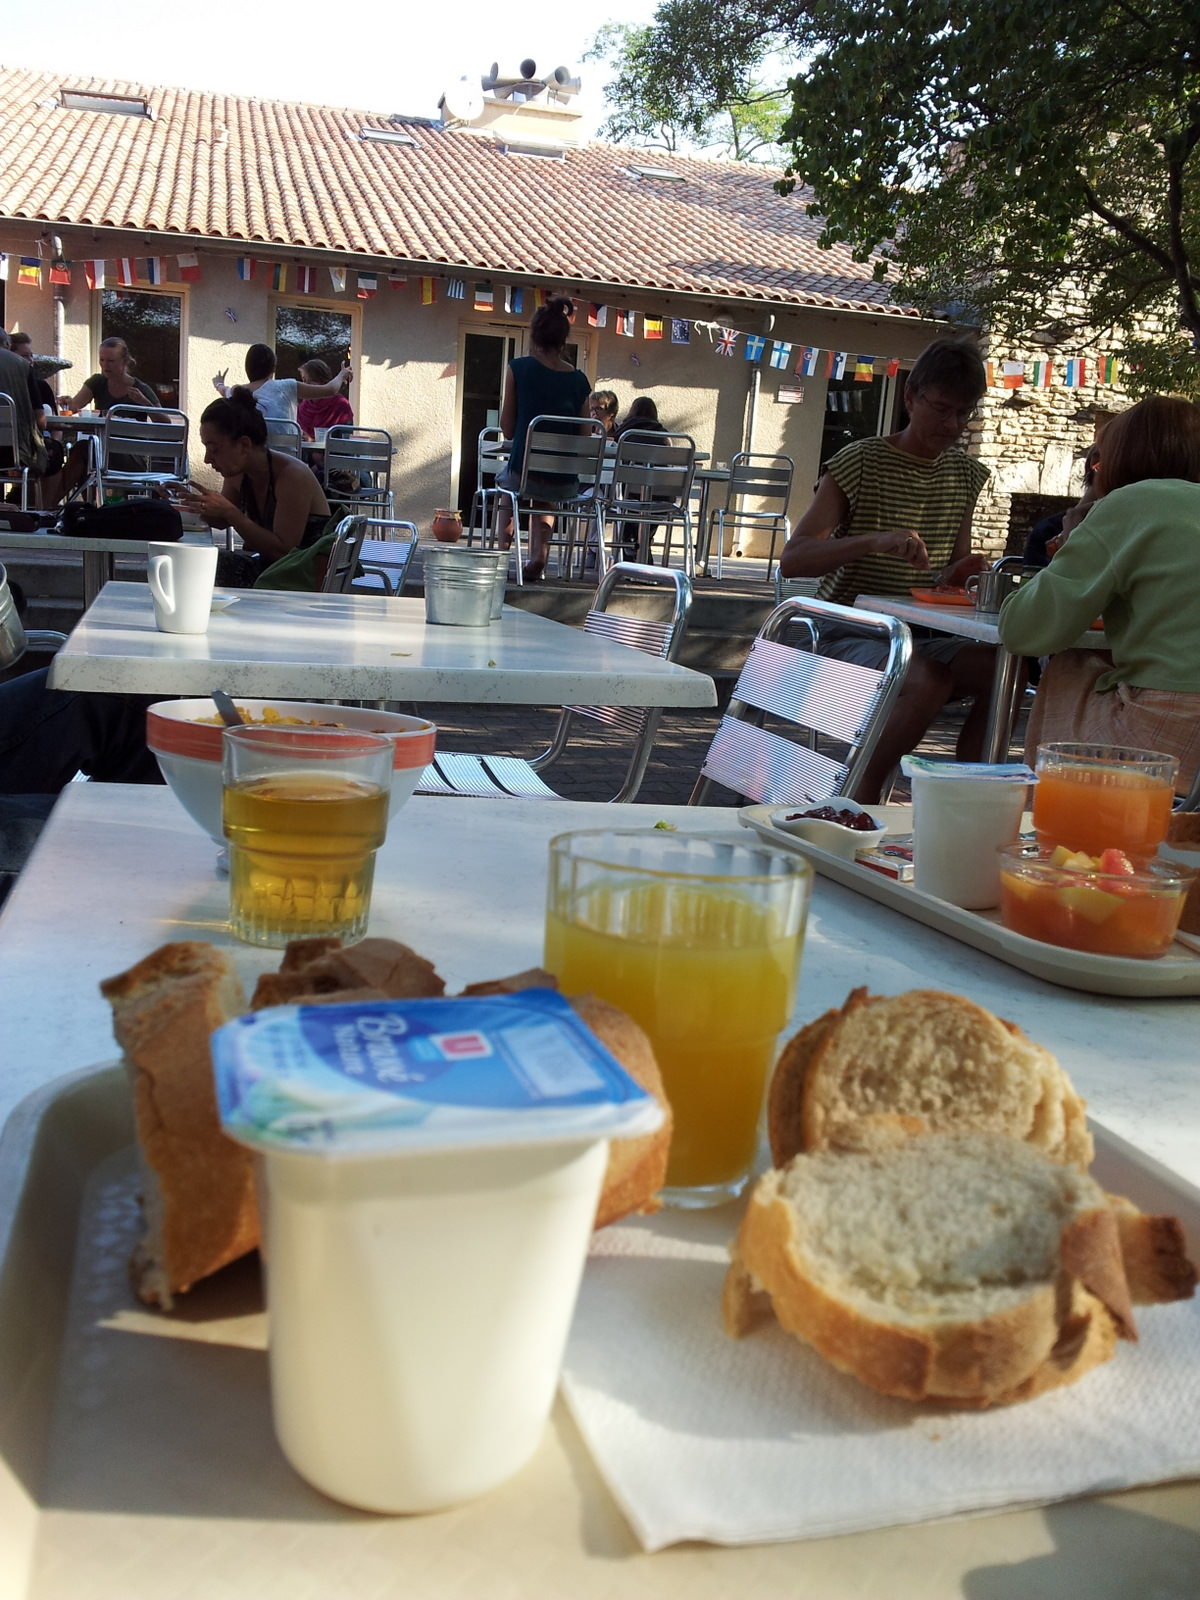 Frühstück in der Jugenherberge Nimes